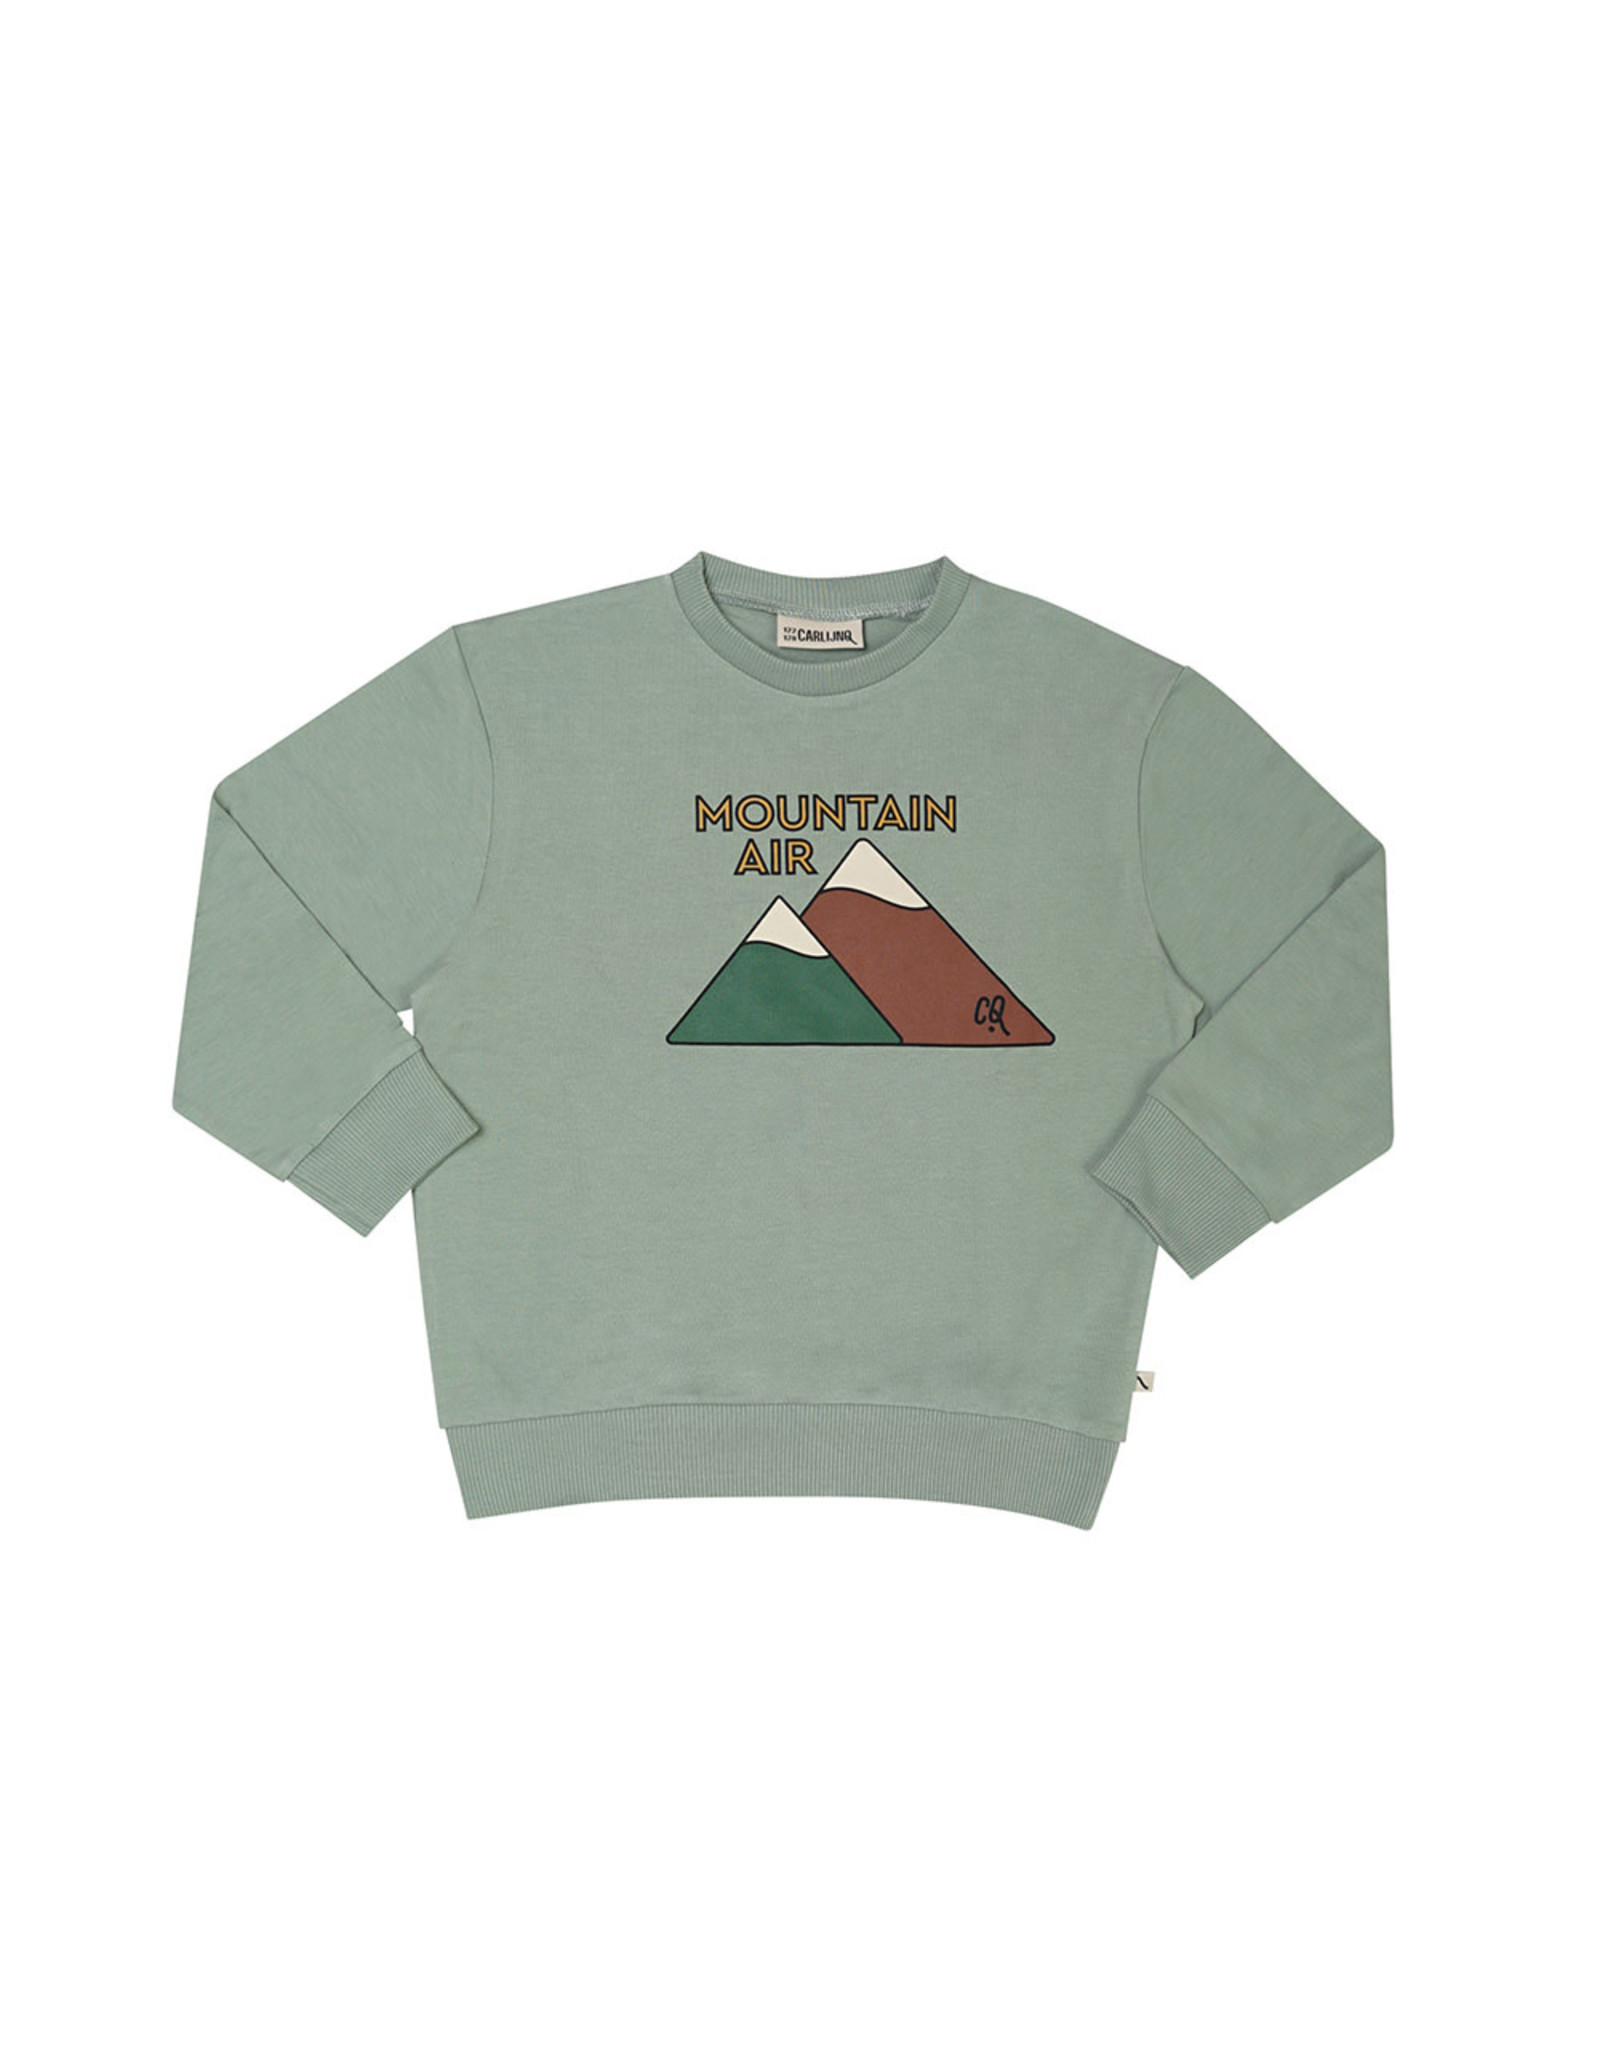 Carlijn Q Carlijn Q Mountain Air - Sweater Wt Print